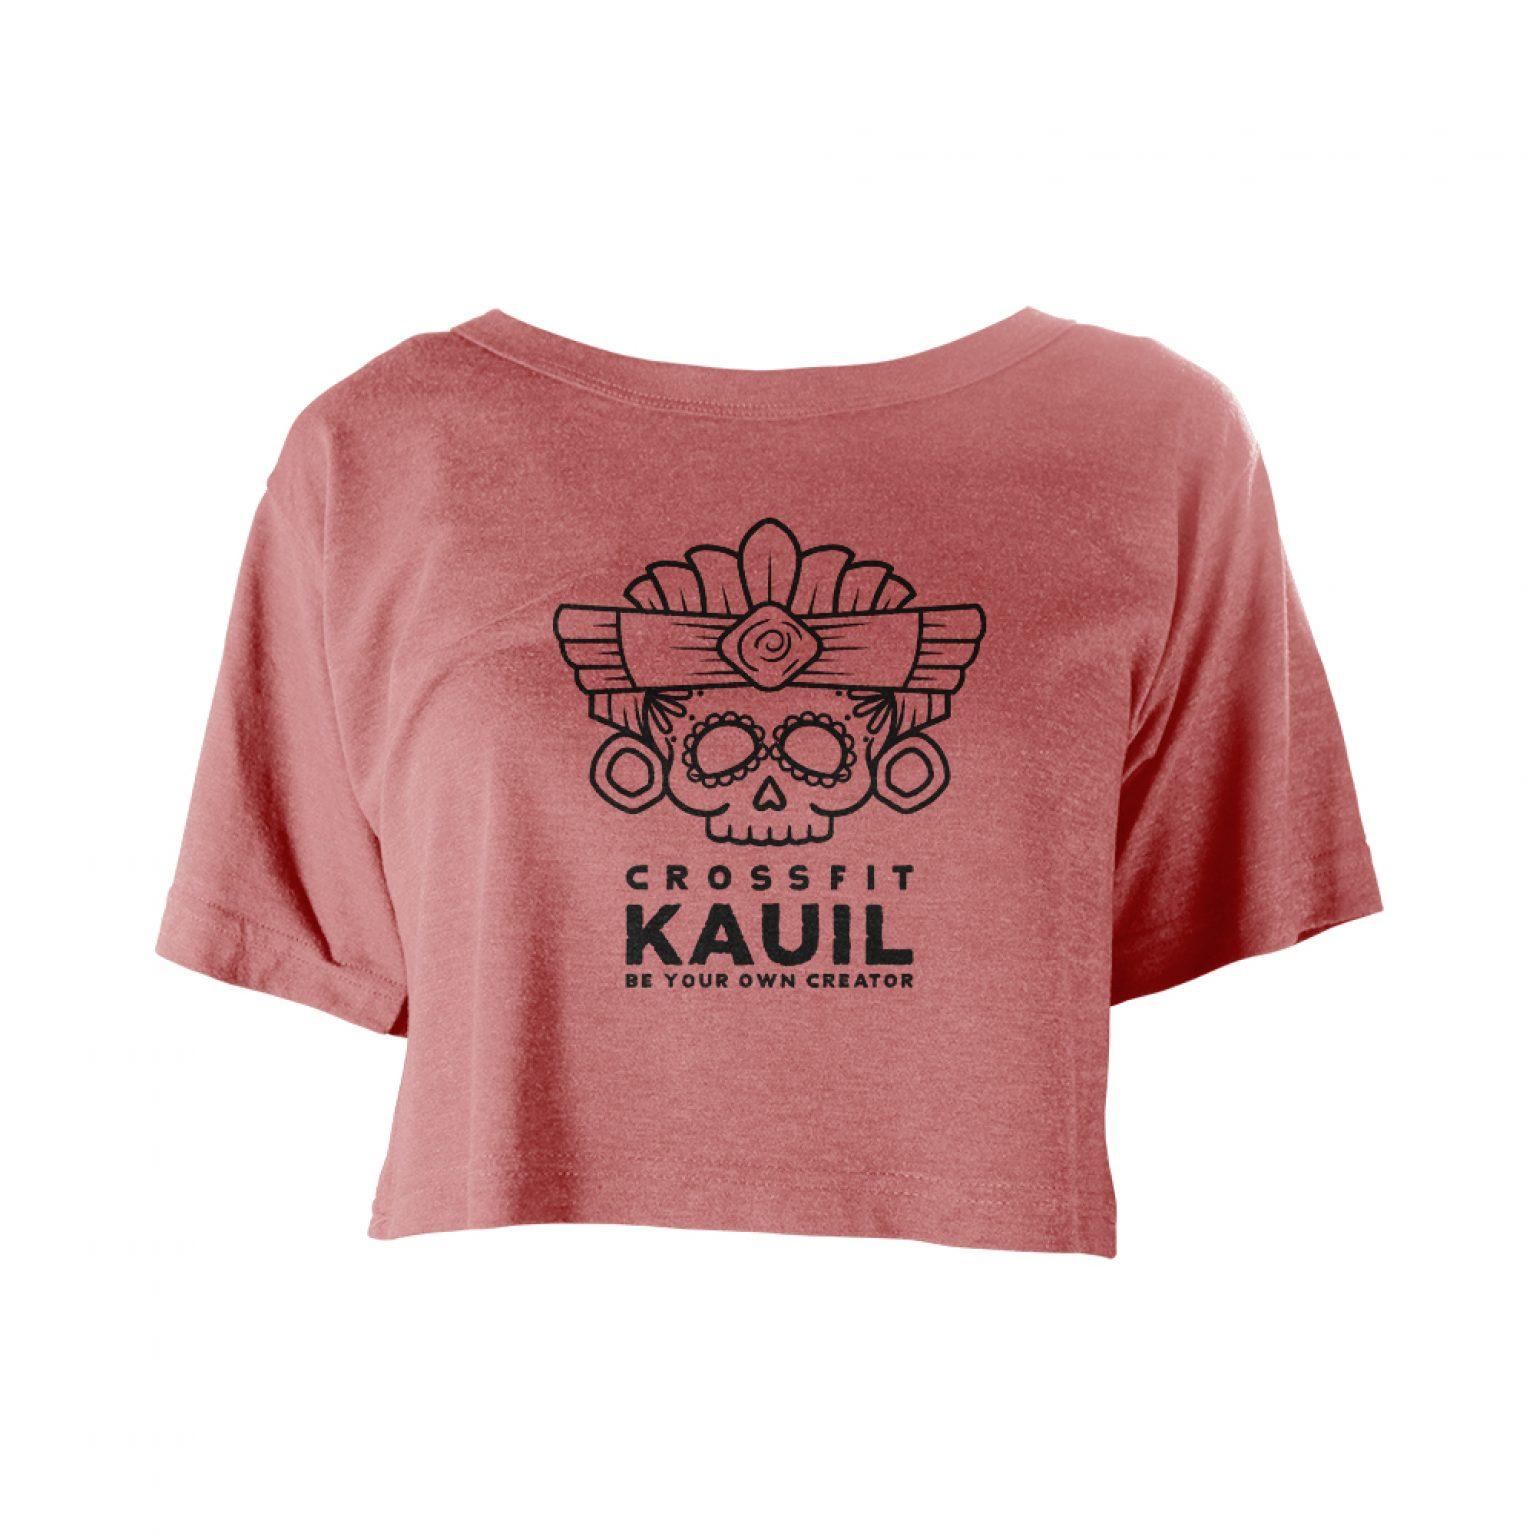 CrossFit Kauil Festival Paprika schwarz